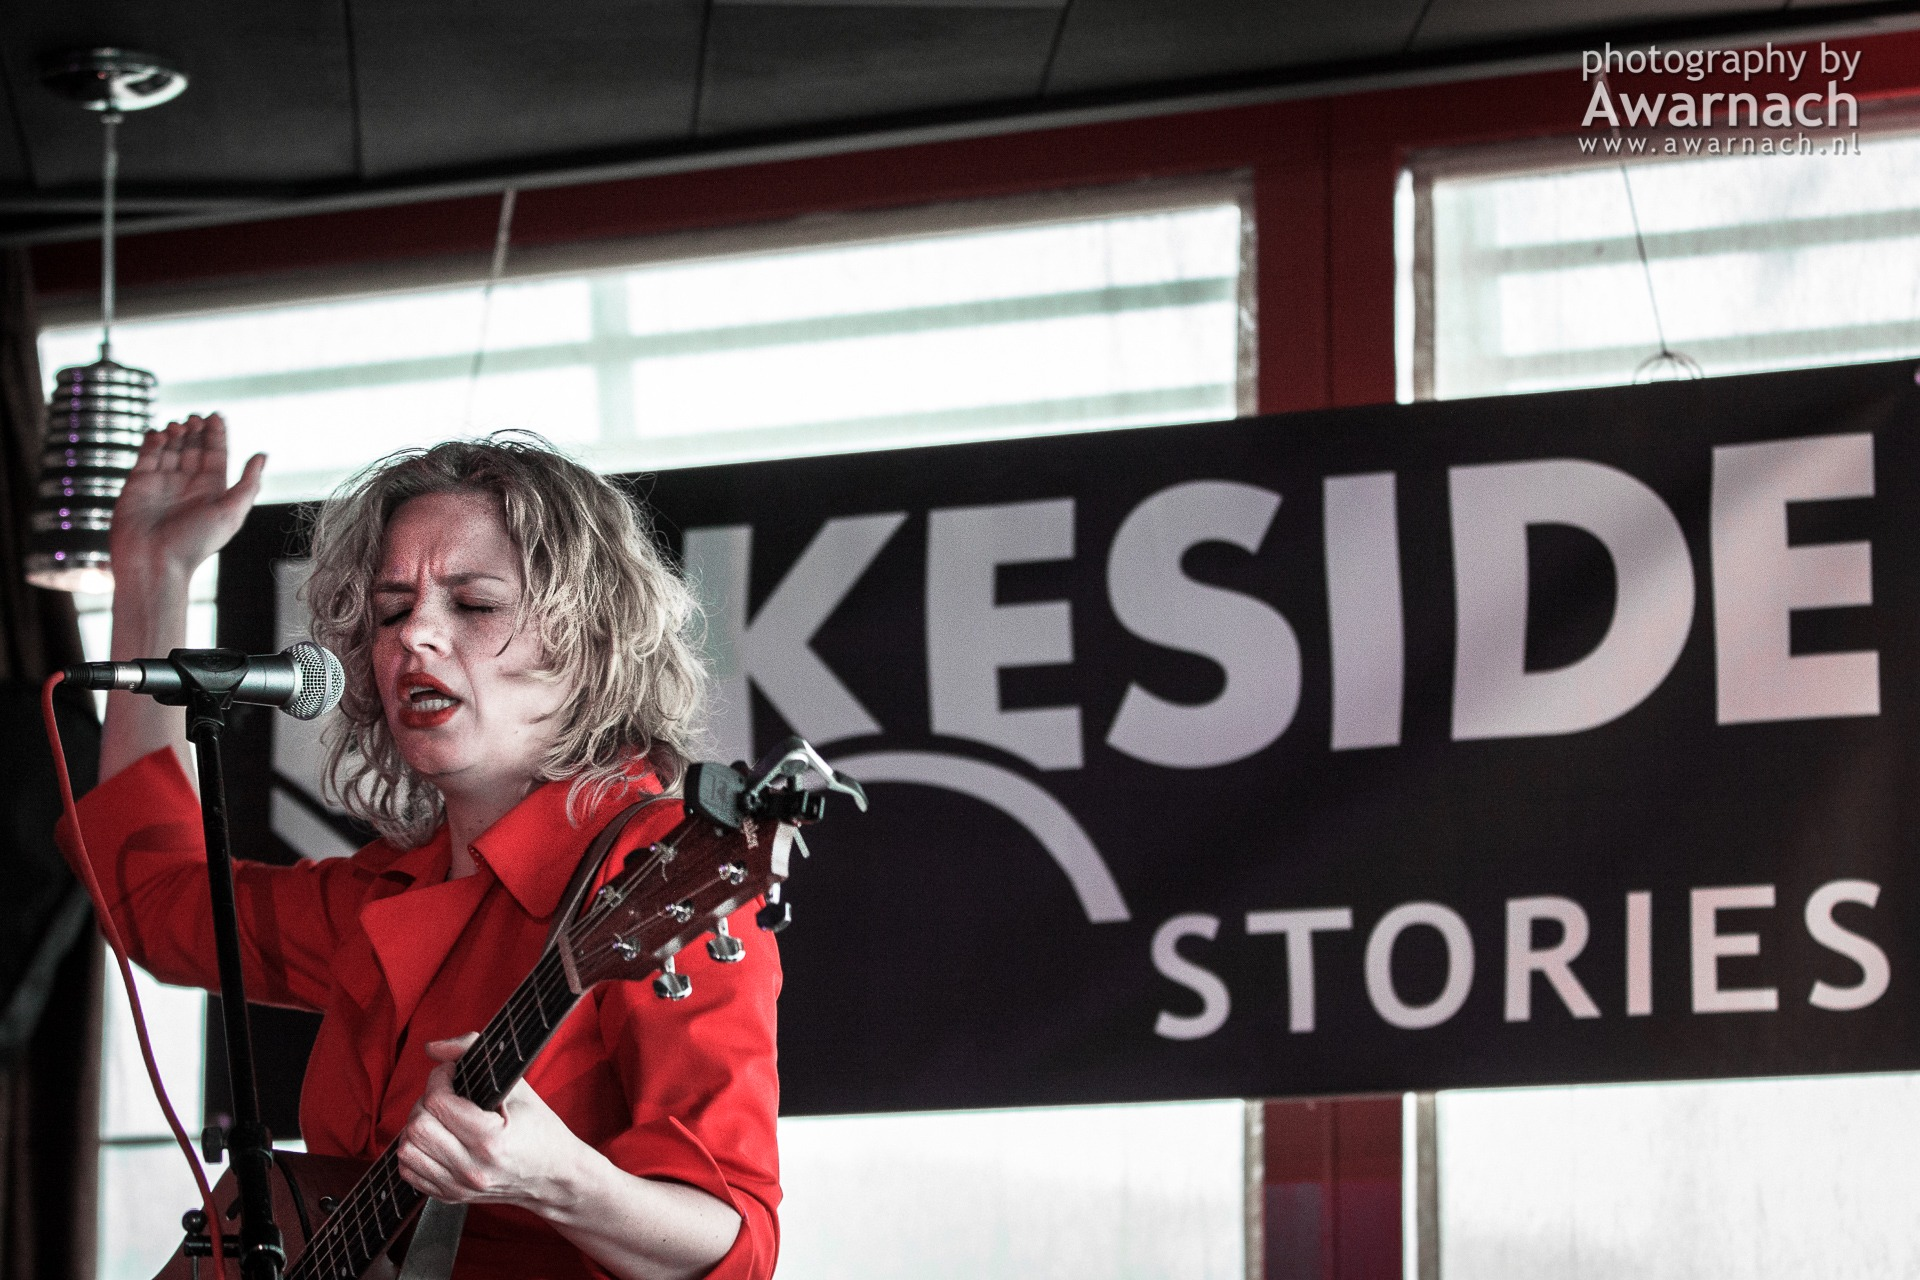 Barbera Breedijk @ Lakeside Stories 2013